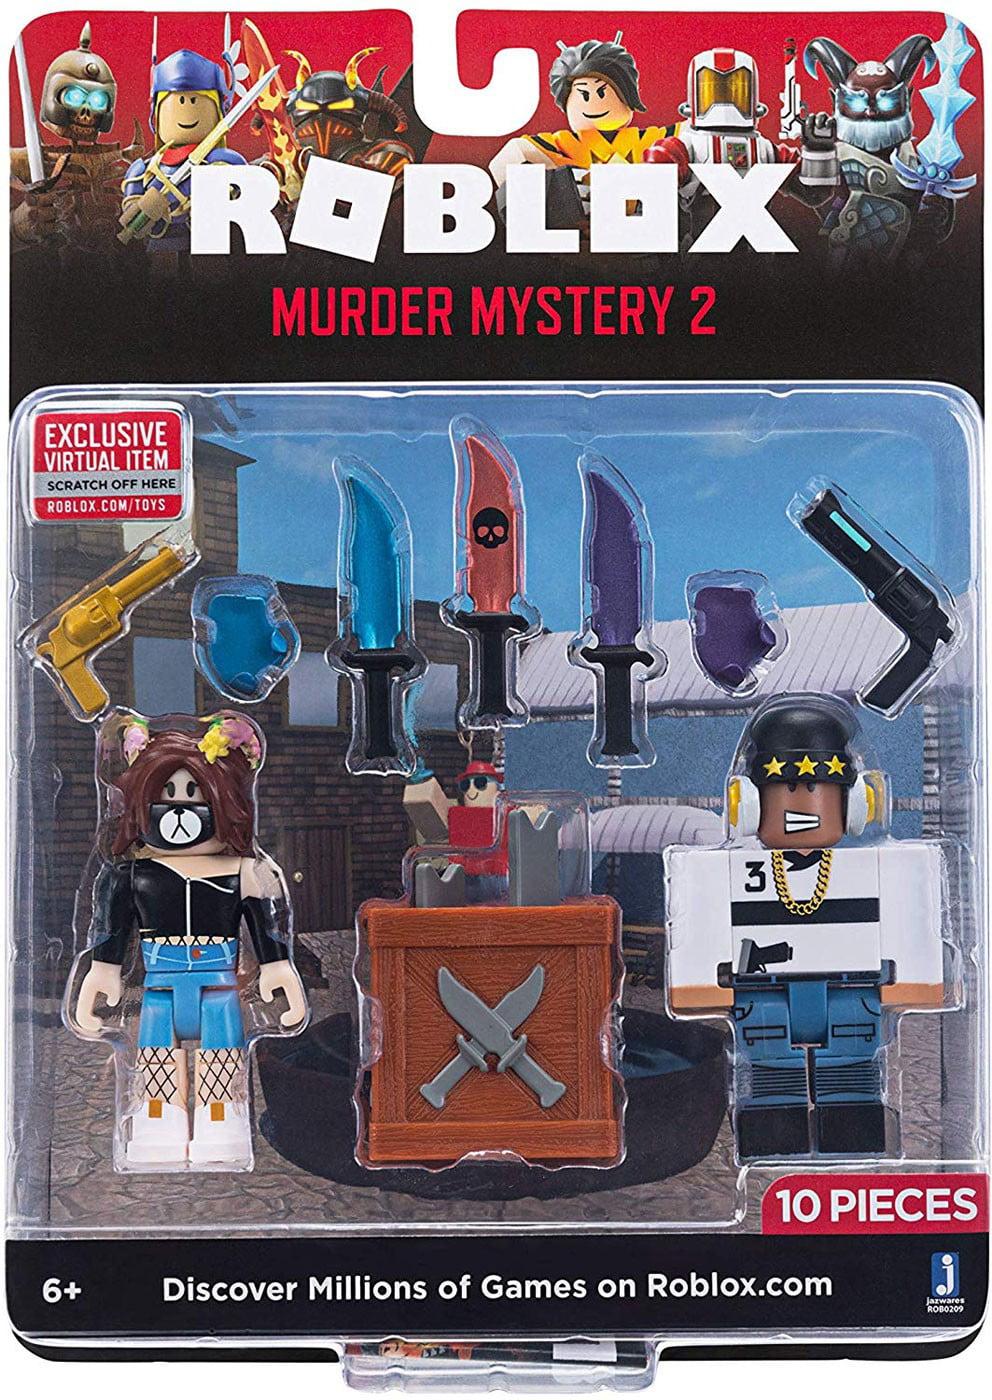 Roblox Wwwtoyscom Roblox Game Packs Murder Mystery 2 W6 Walmart Com Walmart Com